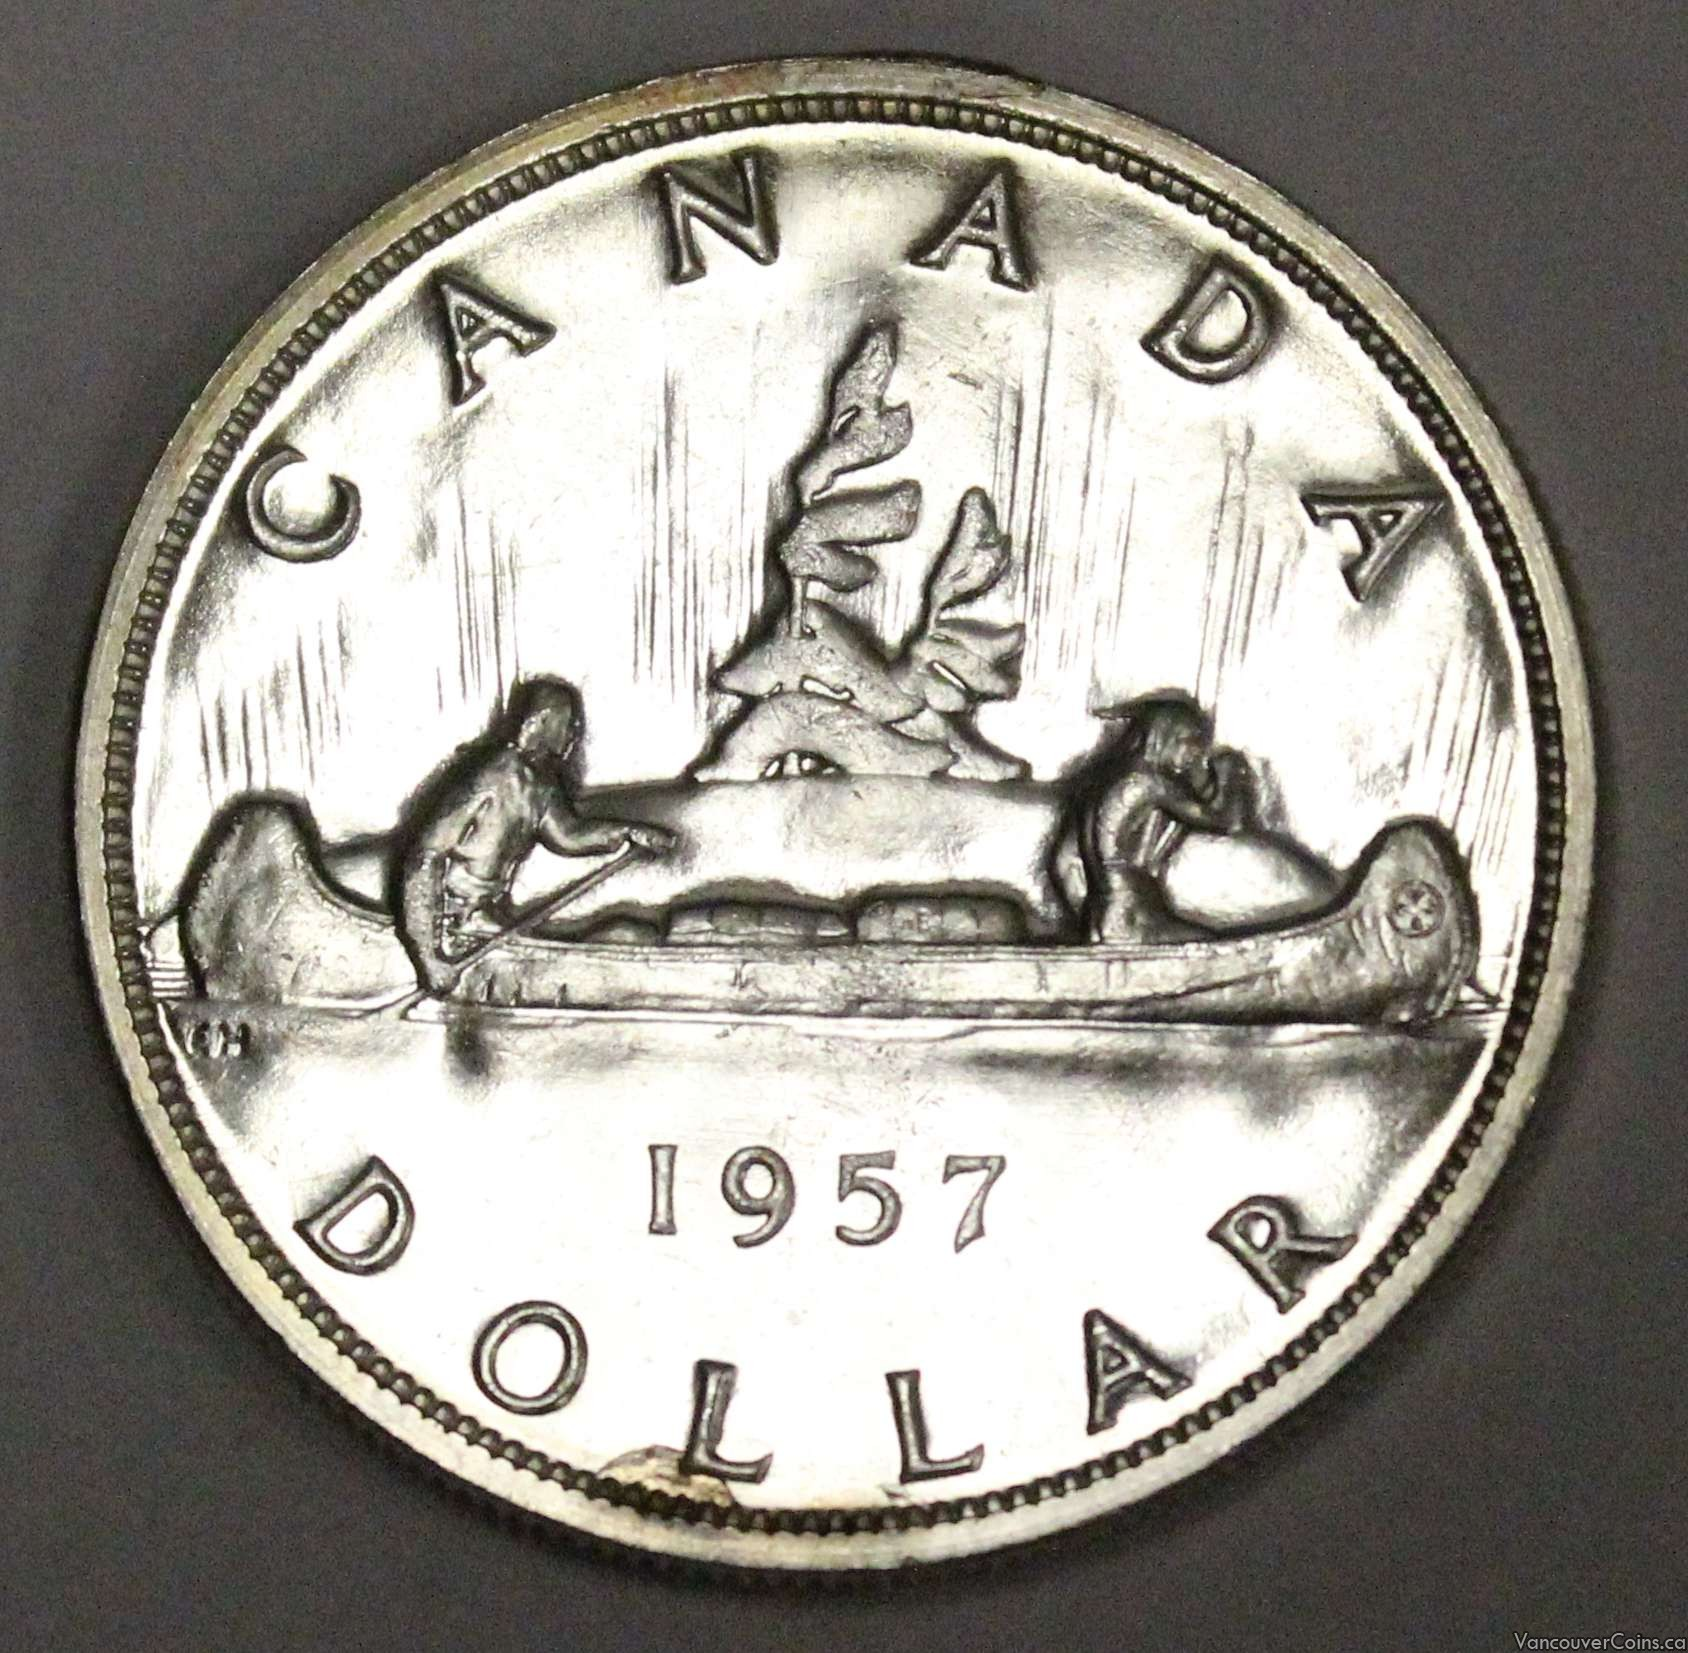 1993 Original Mint Roll Quarters